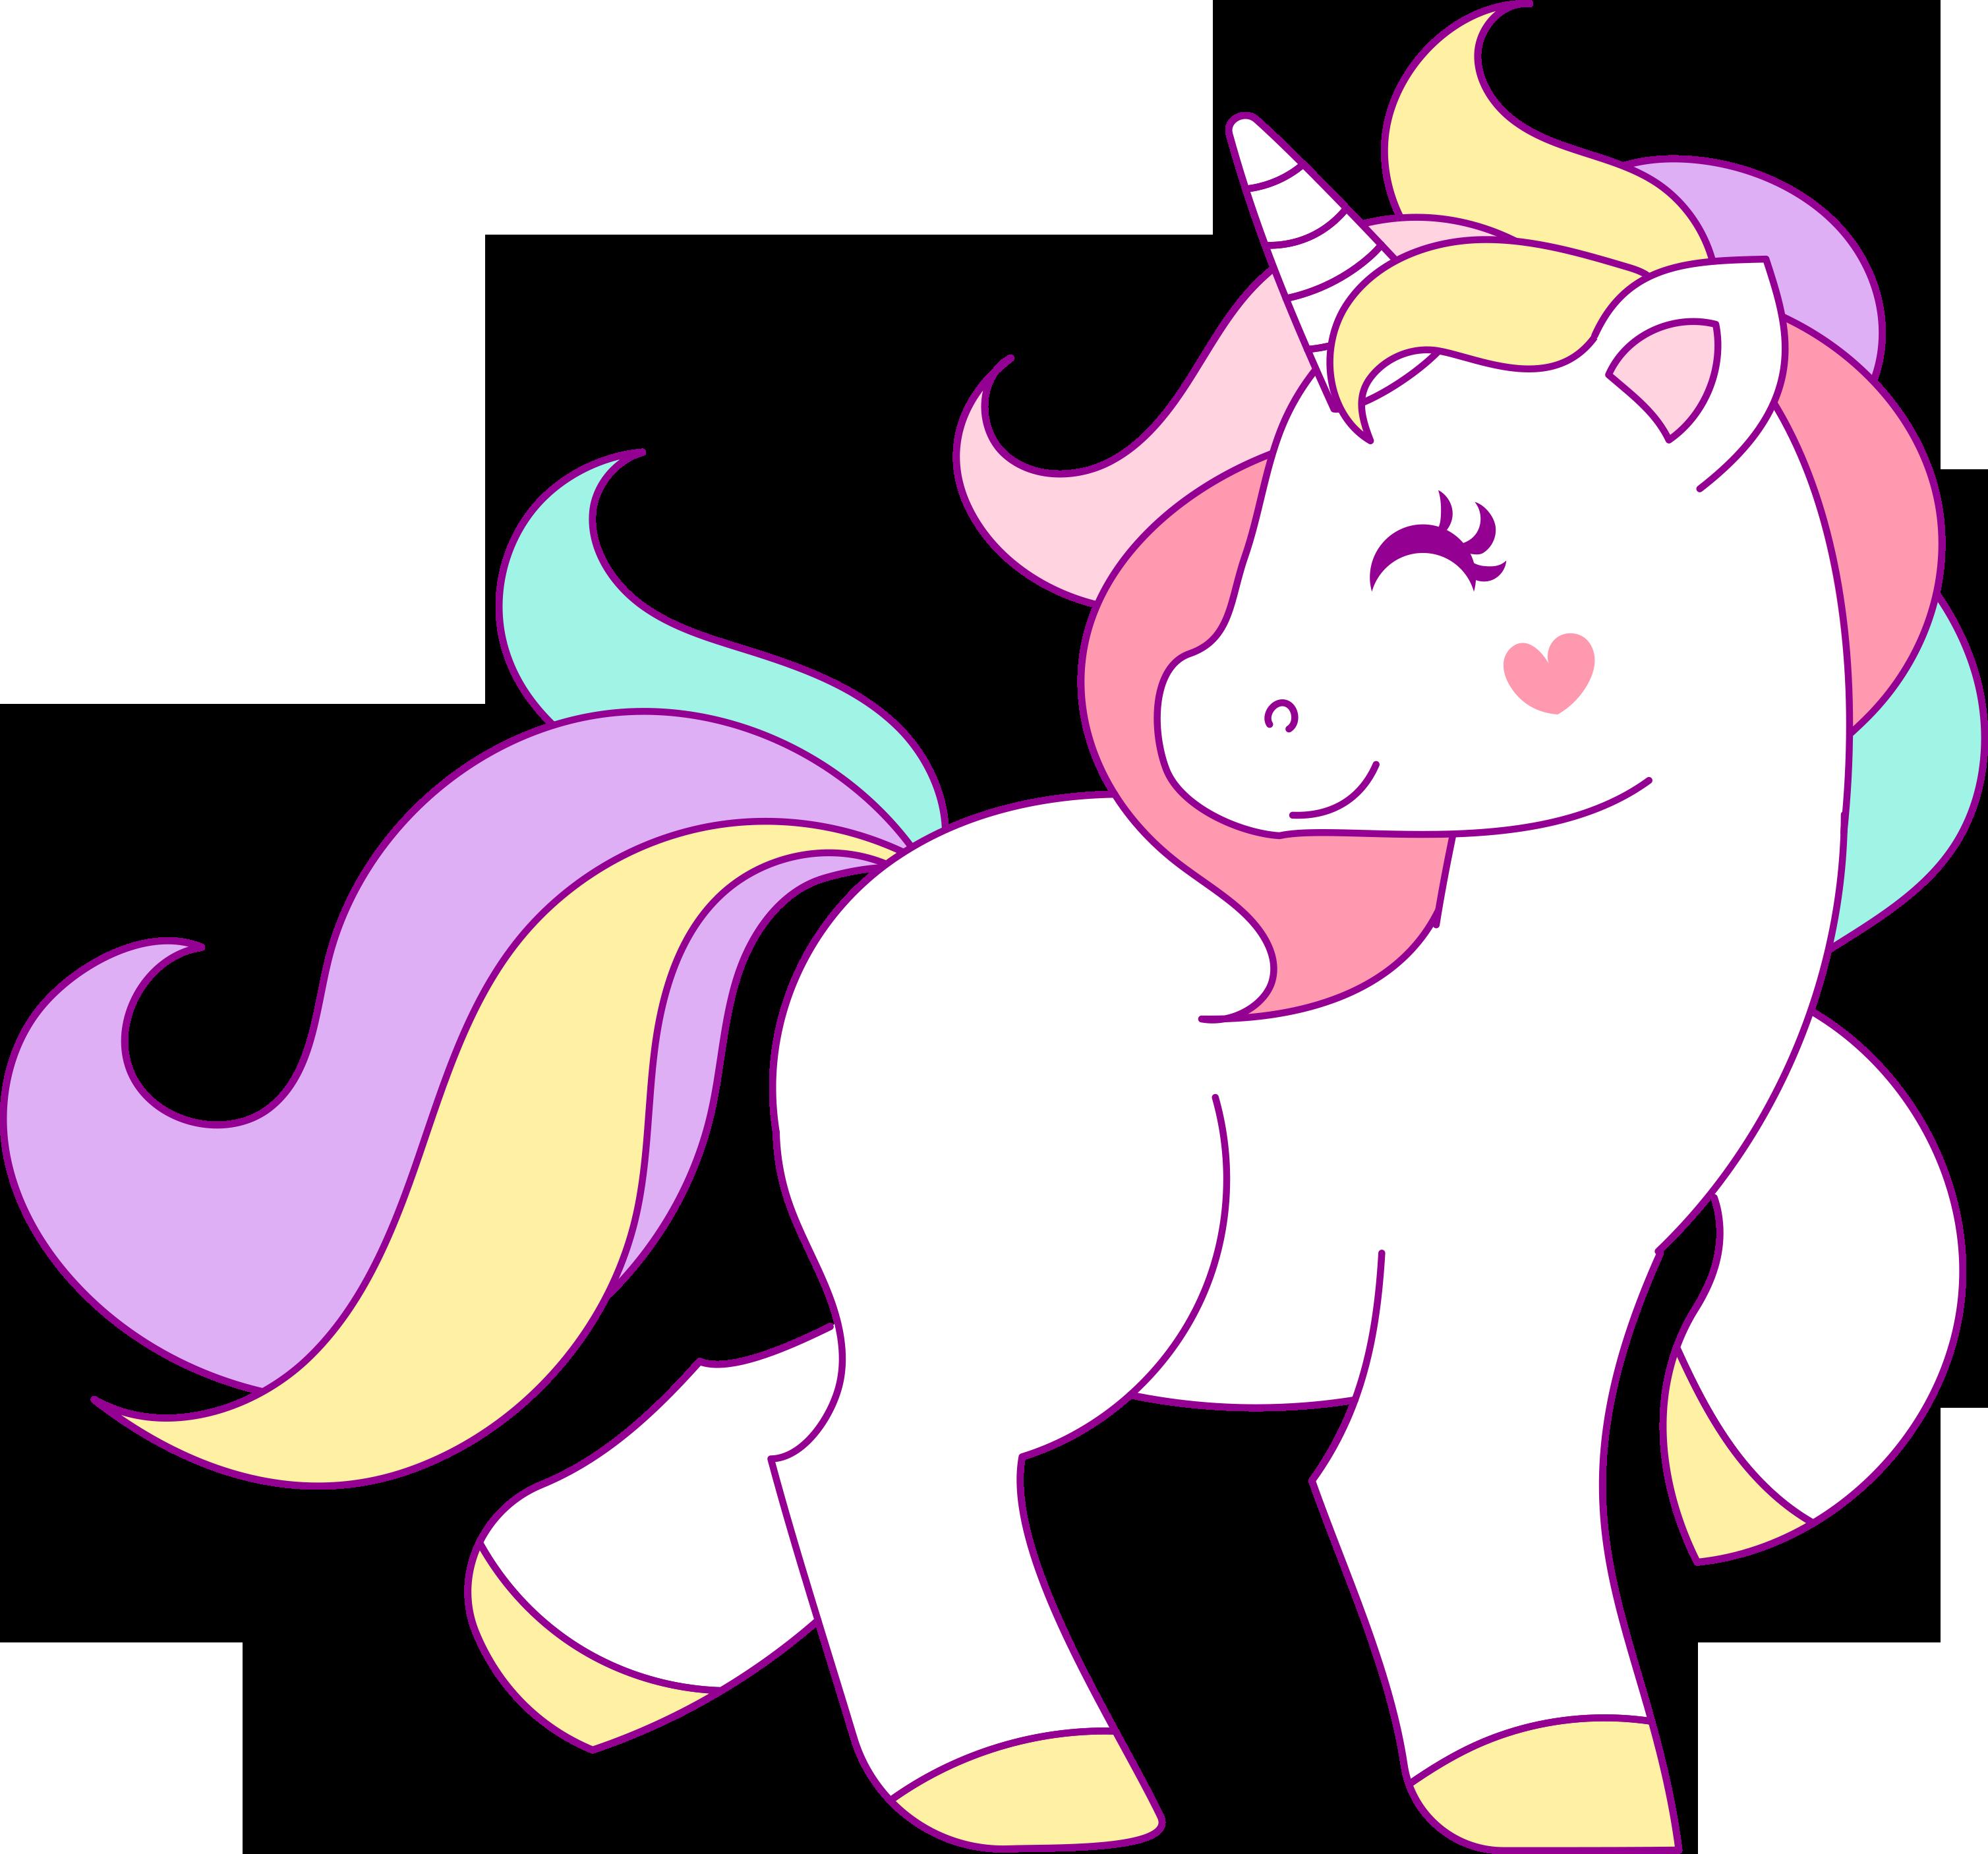 3016x2813 Unicorns 7.png Unicorns